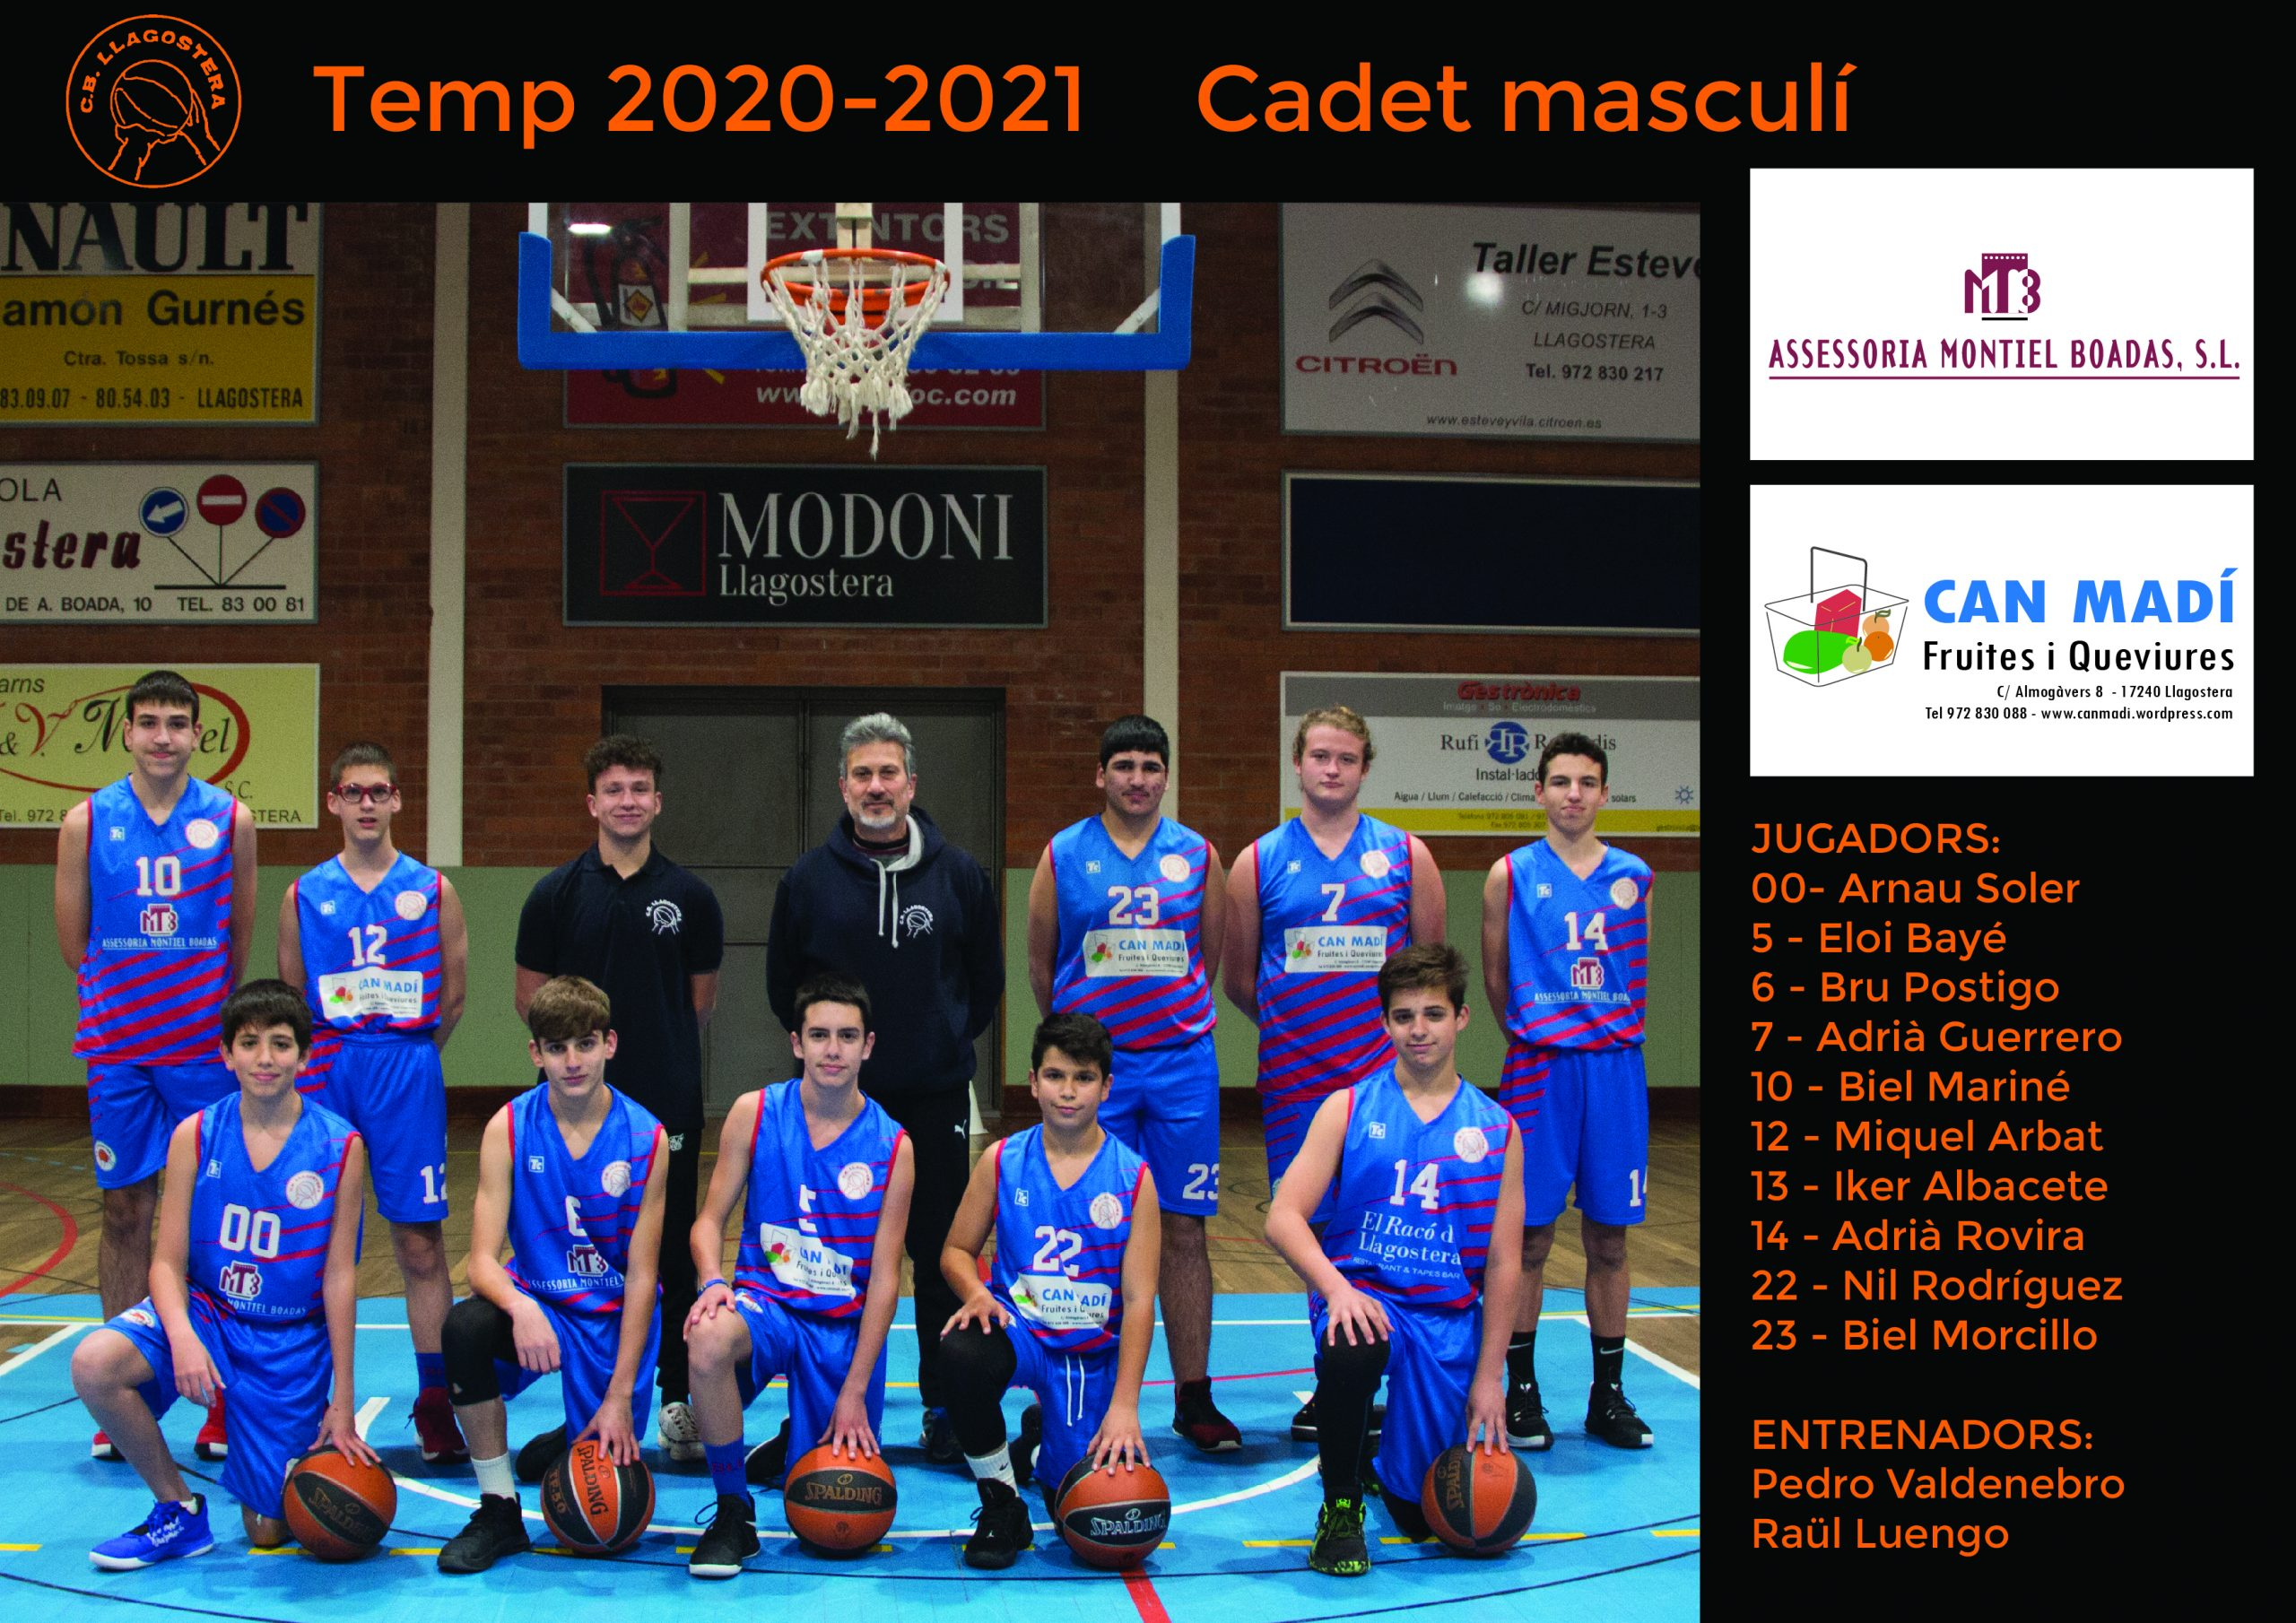 http://www.cbllagostera.com/wp-content/uploads/2021/04/CadetMasculi_A4-01-scaled.jpg